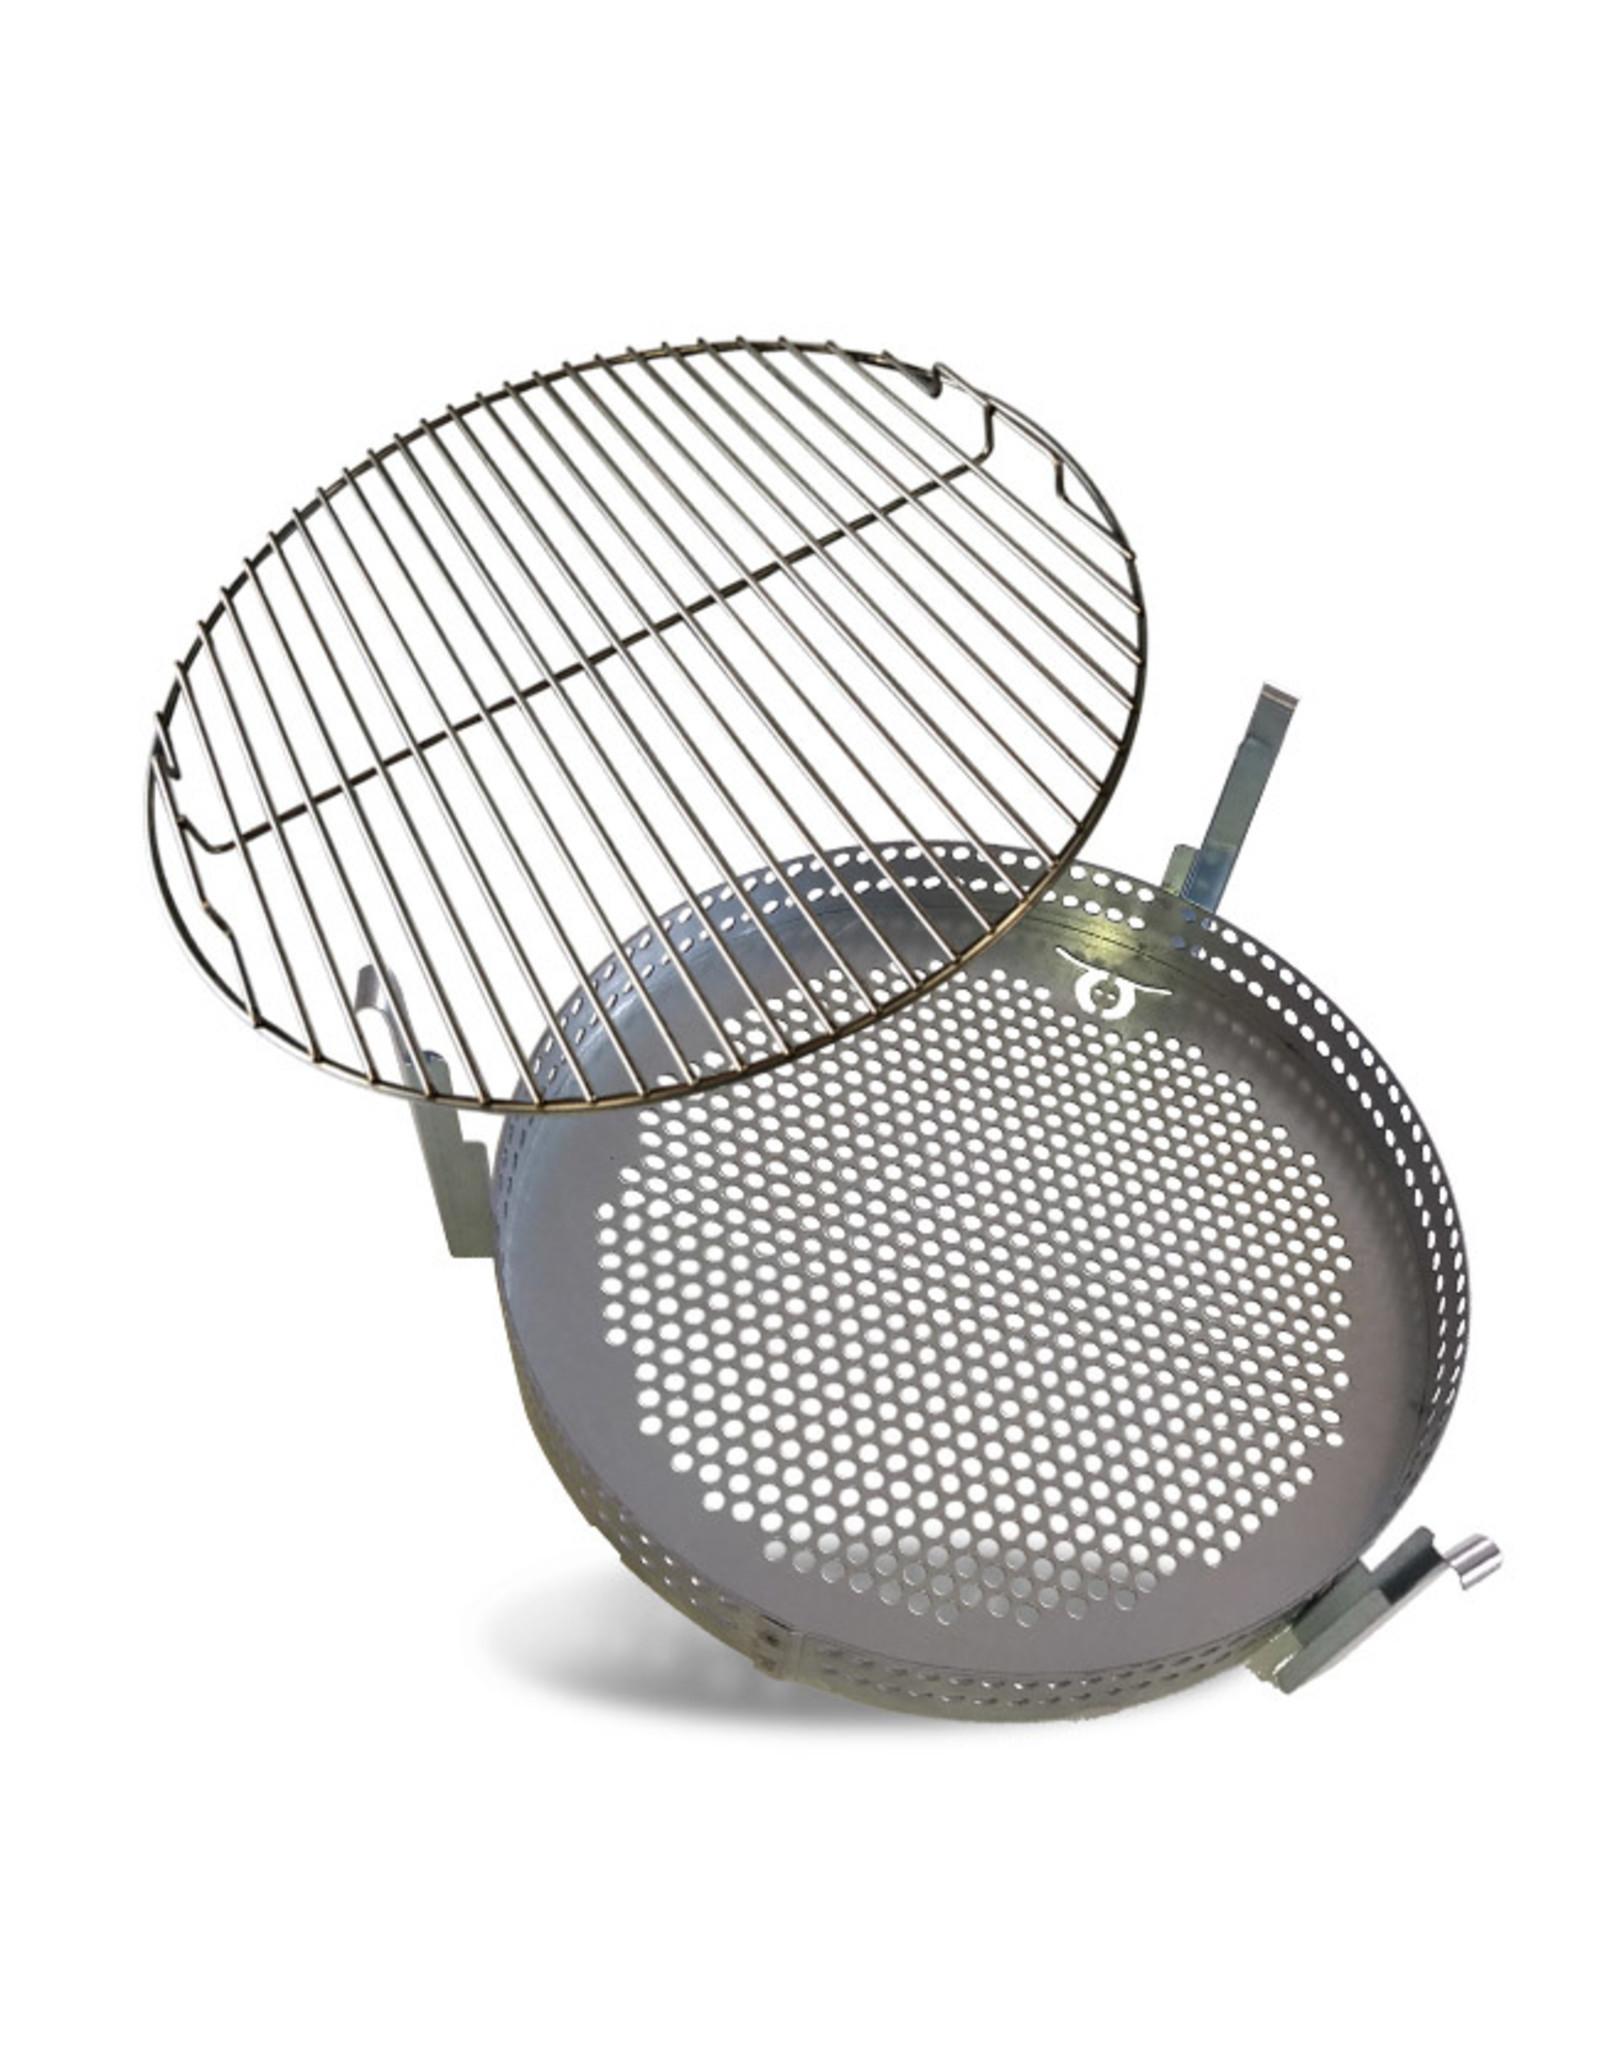 BarrelQ BarrelQ Small zwart 60 Liter Barbecue, vuurkorf en statafel in één inclusief beschermhoes